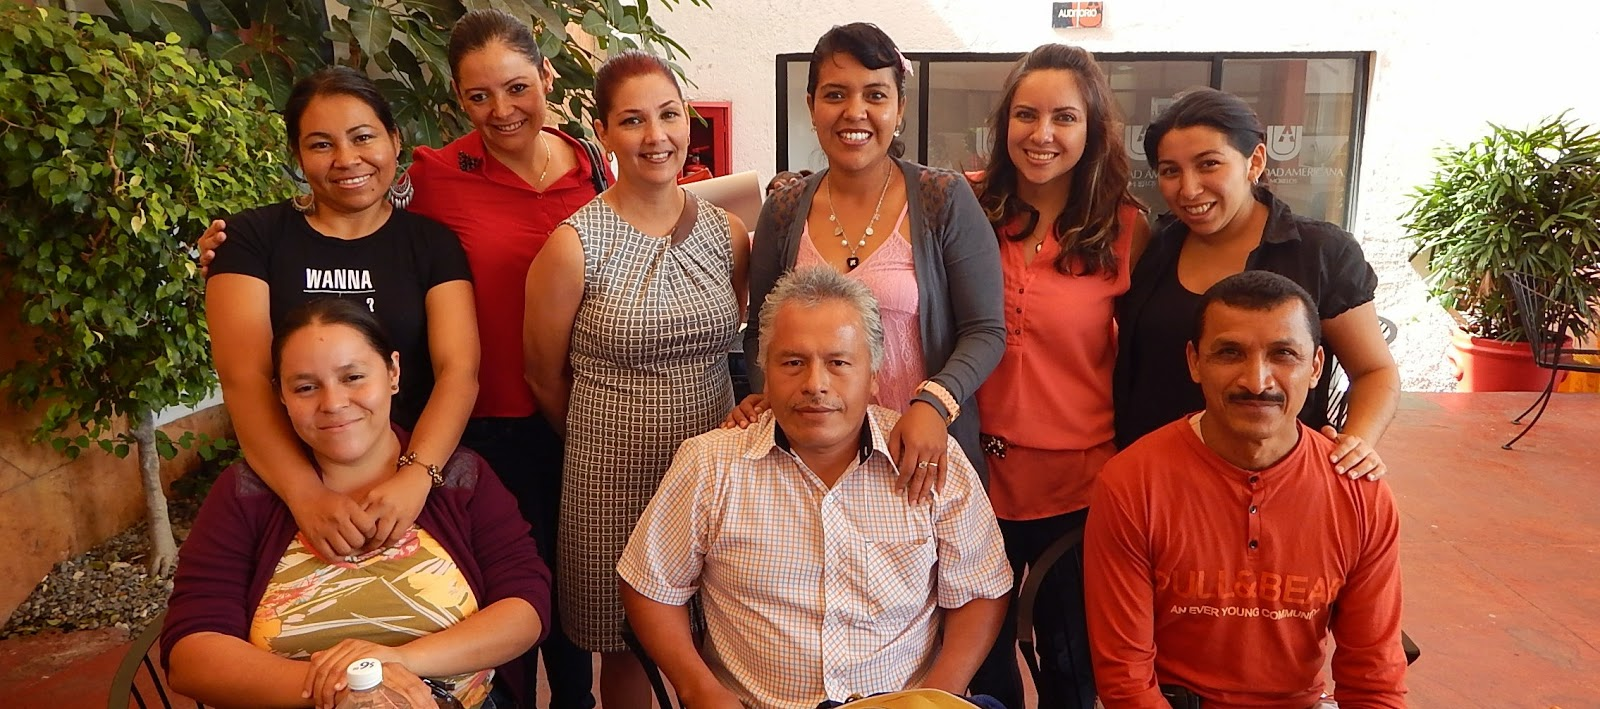 Gaceta uam participan exitosamente egresados de la for Concurso para plazas docentes